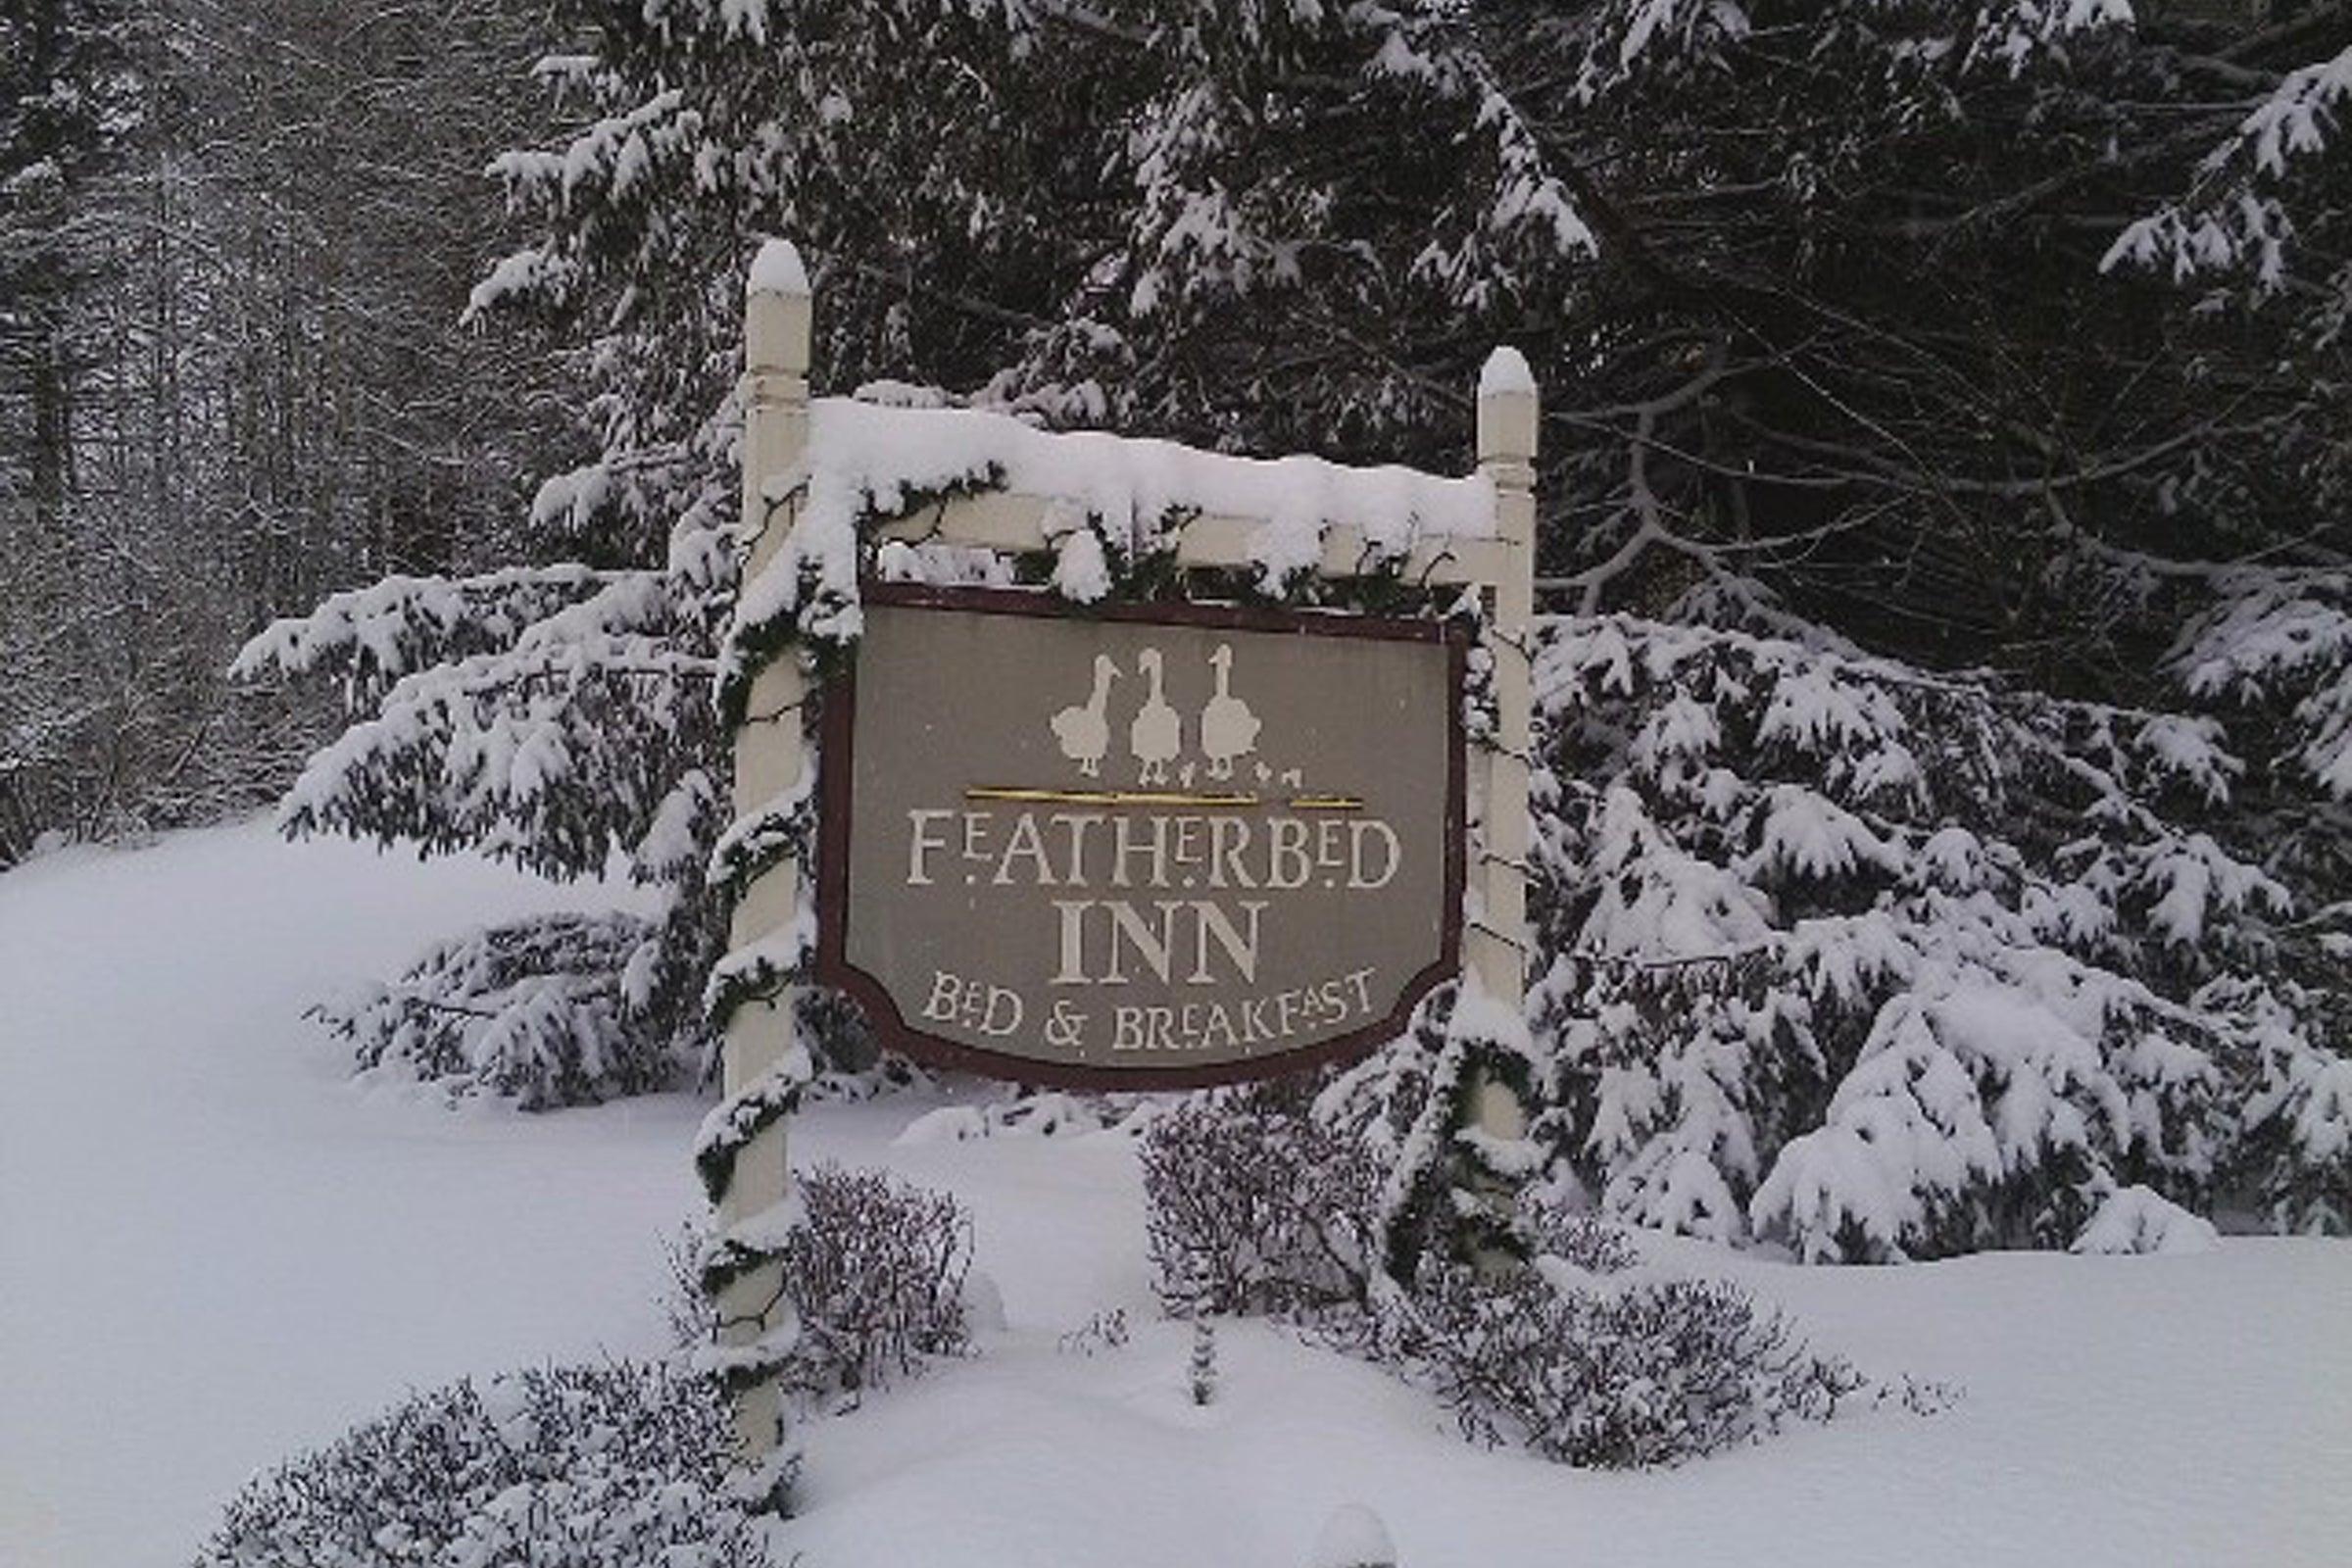 Featherbed Inn